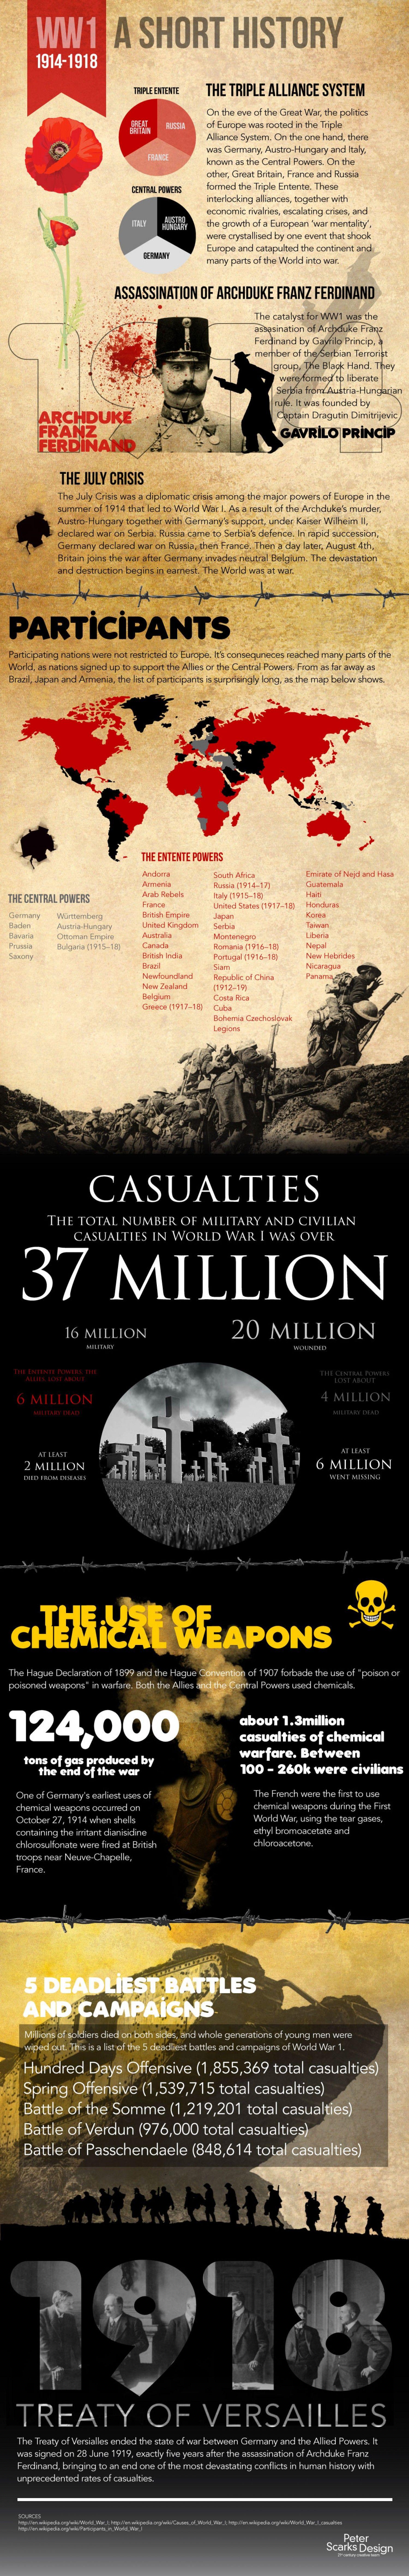 World War I A Short History Infographic